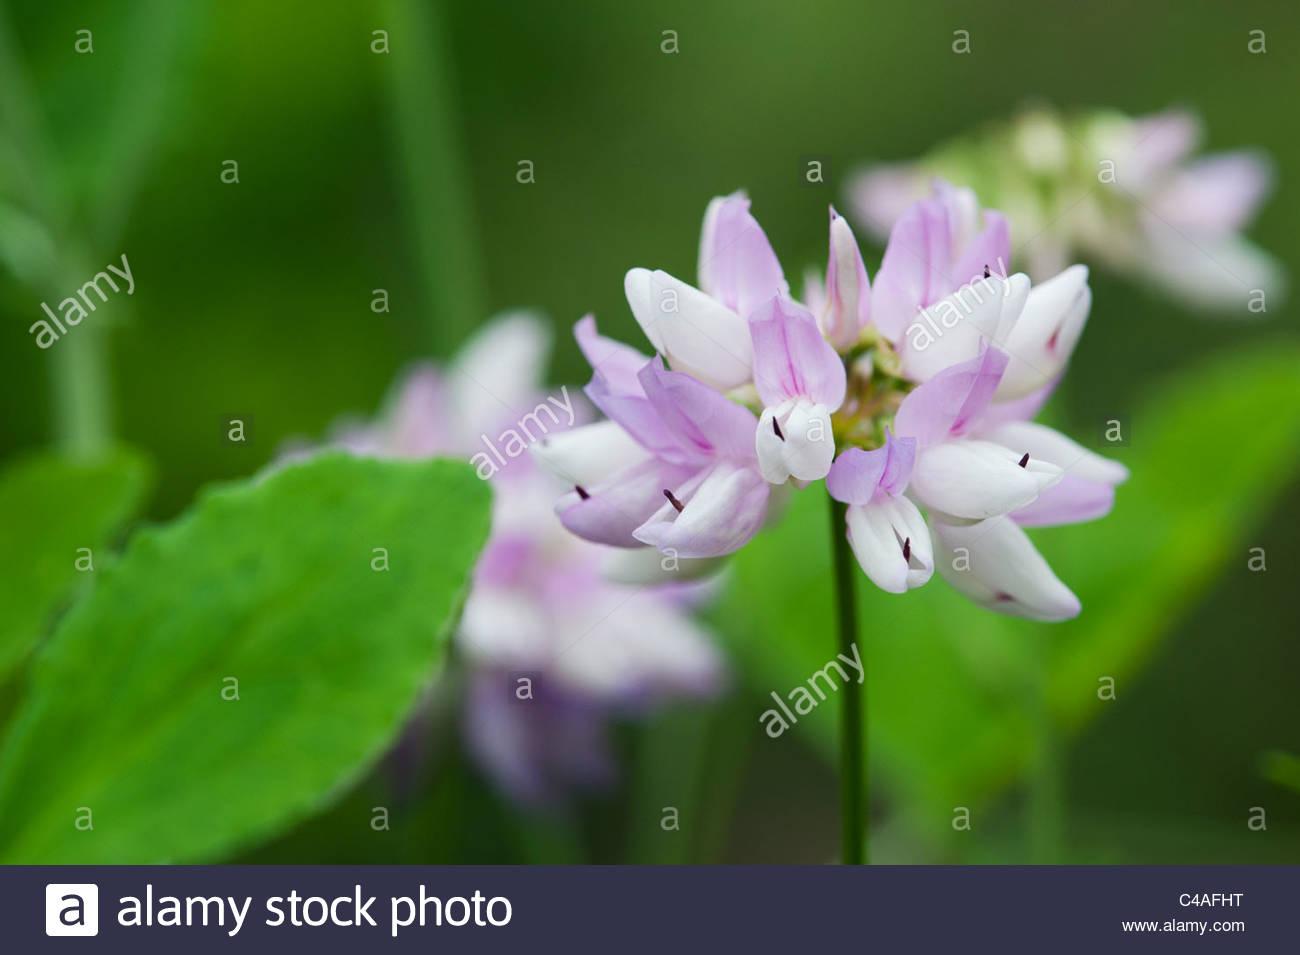 Crown vetch stock photos crown vetch stock images alamy coronilla varia purple crown vetch flower stock image izmirmasajfo